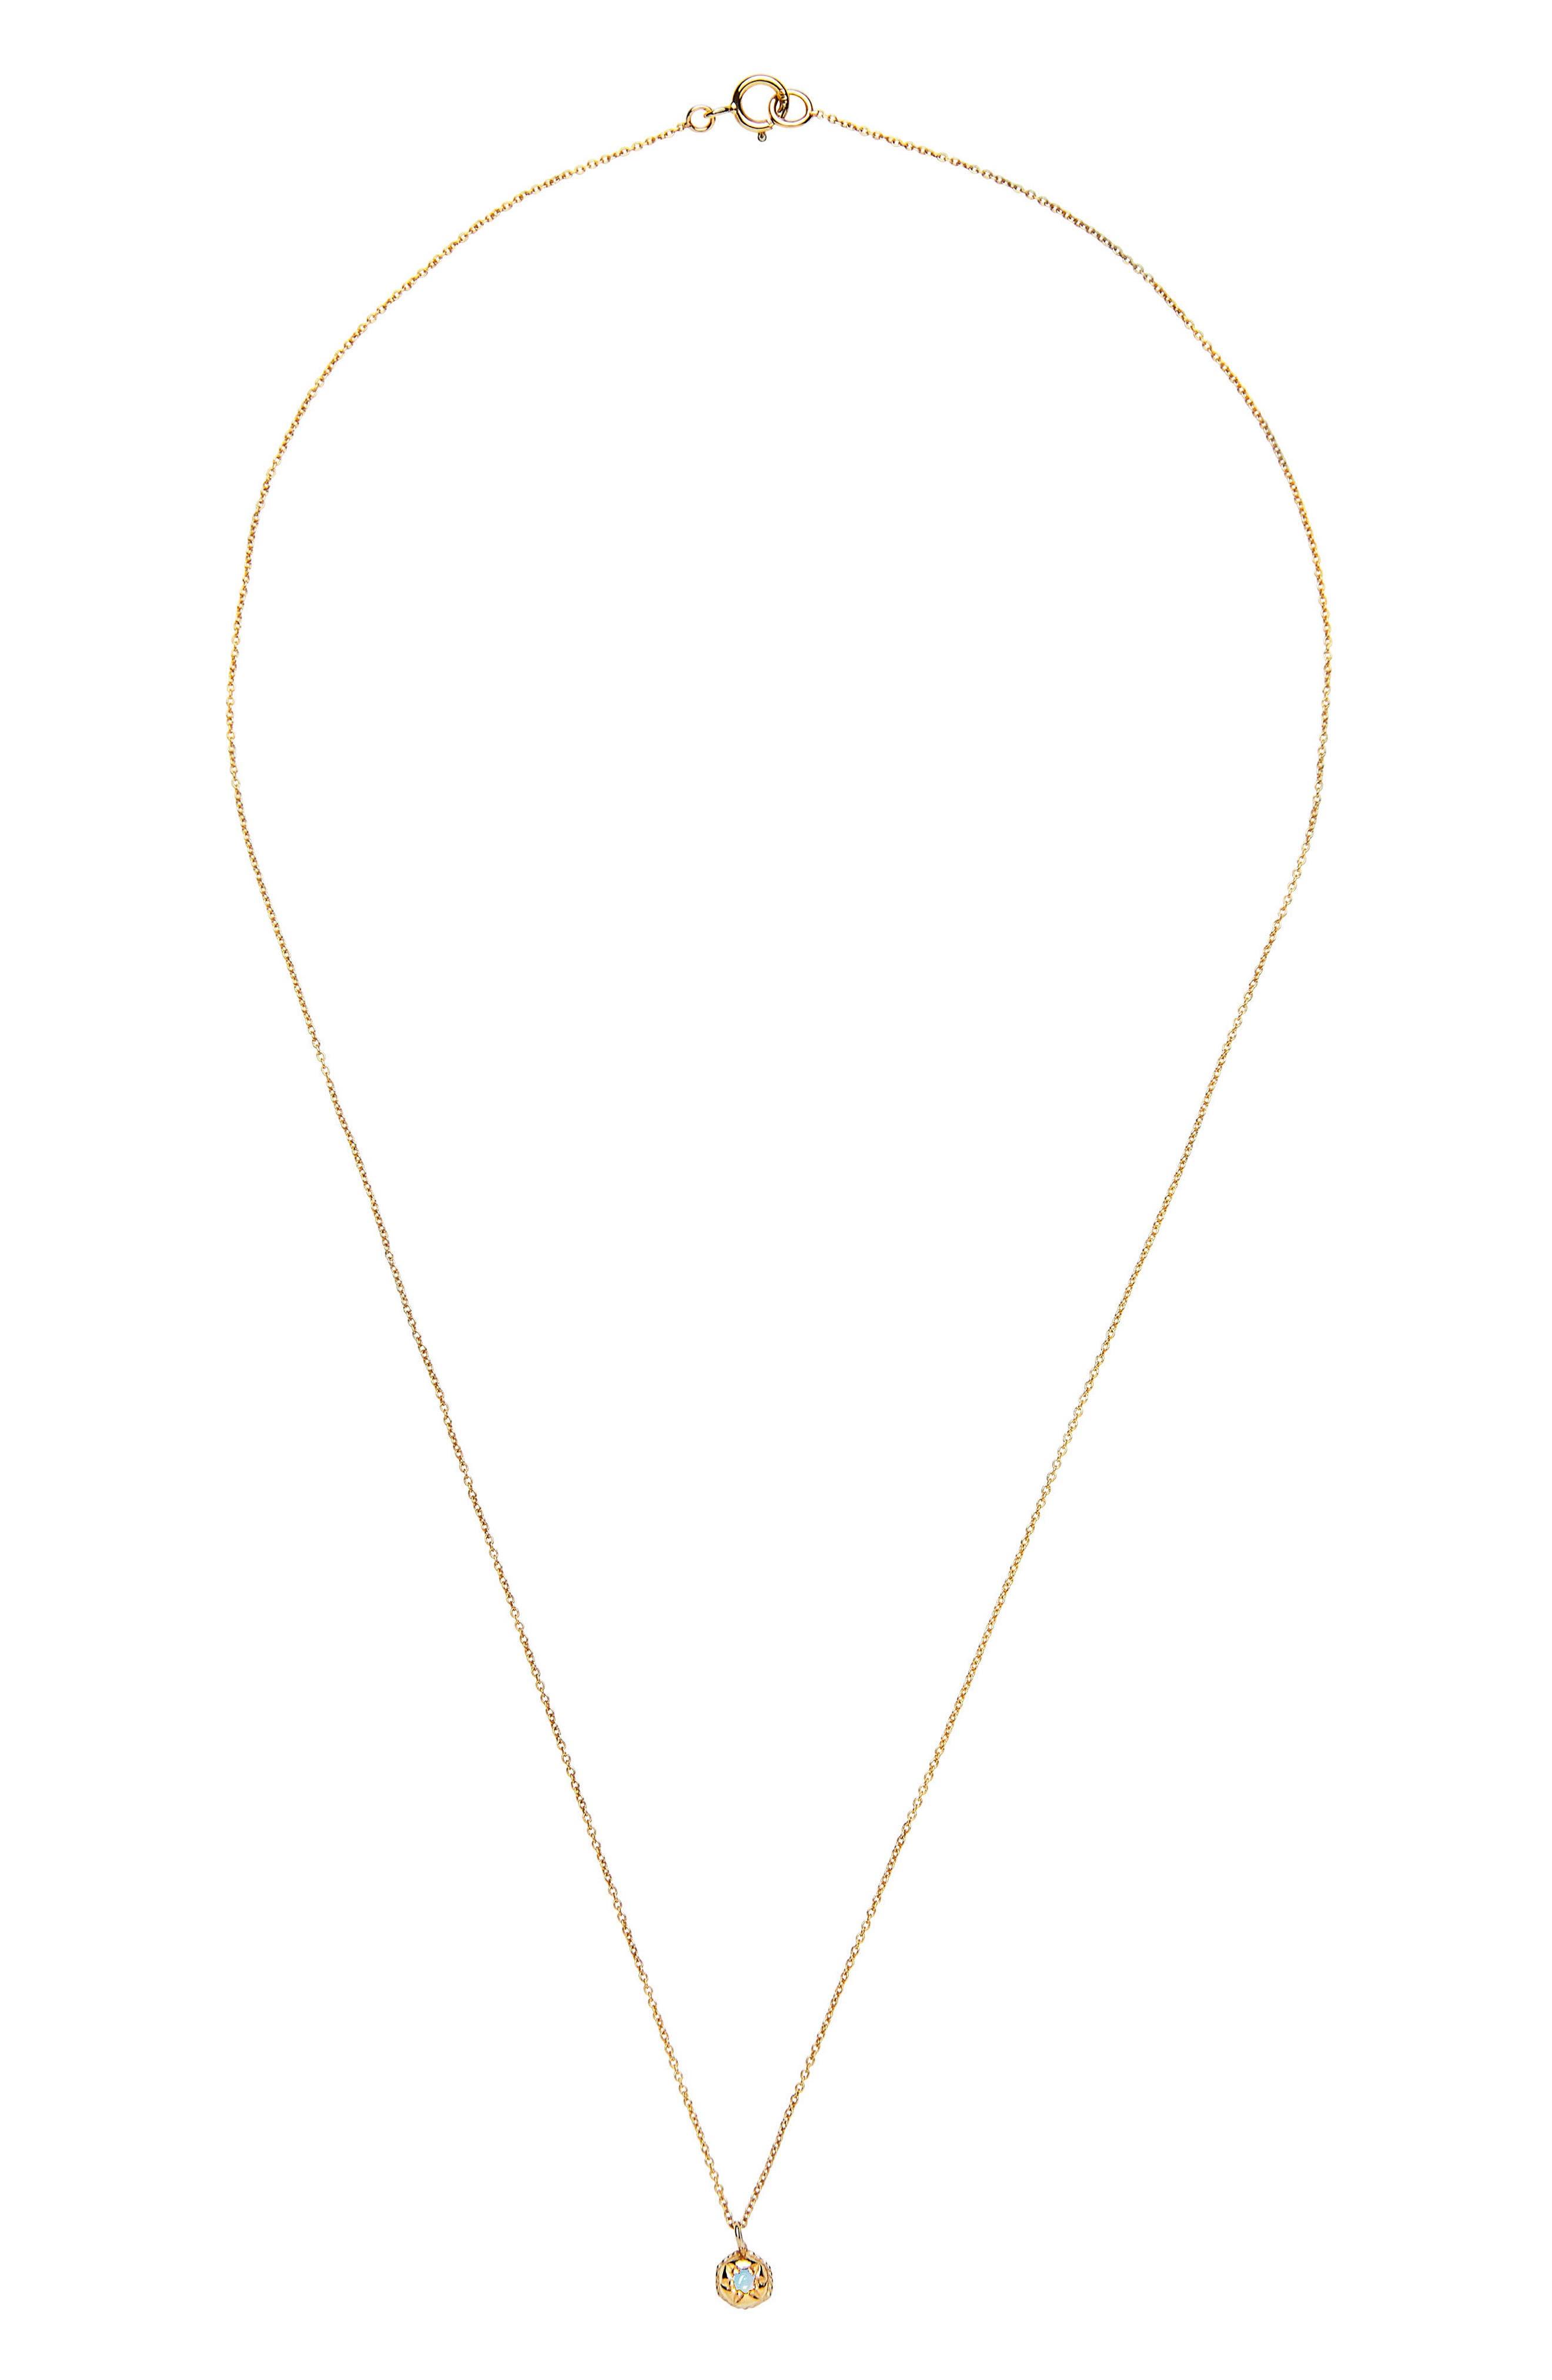 Mystic Opal Pendant Necklace,                             Alternate thumbnail 2, color,                             YELLOW GOLD/ OPAL